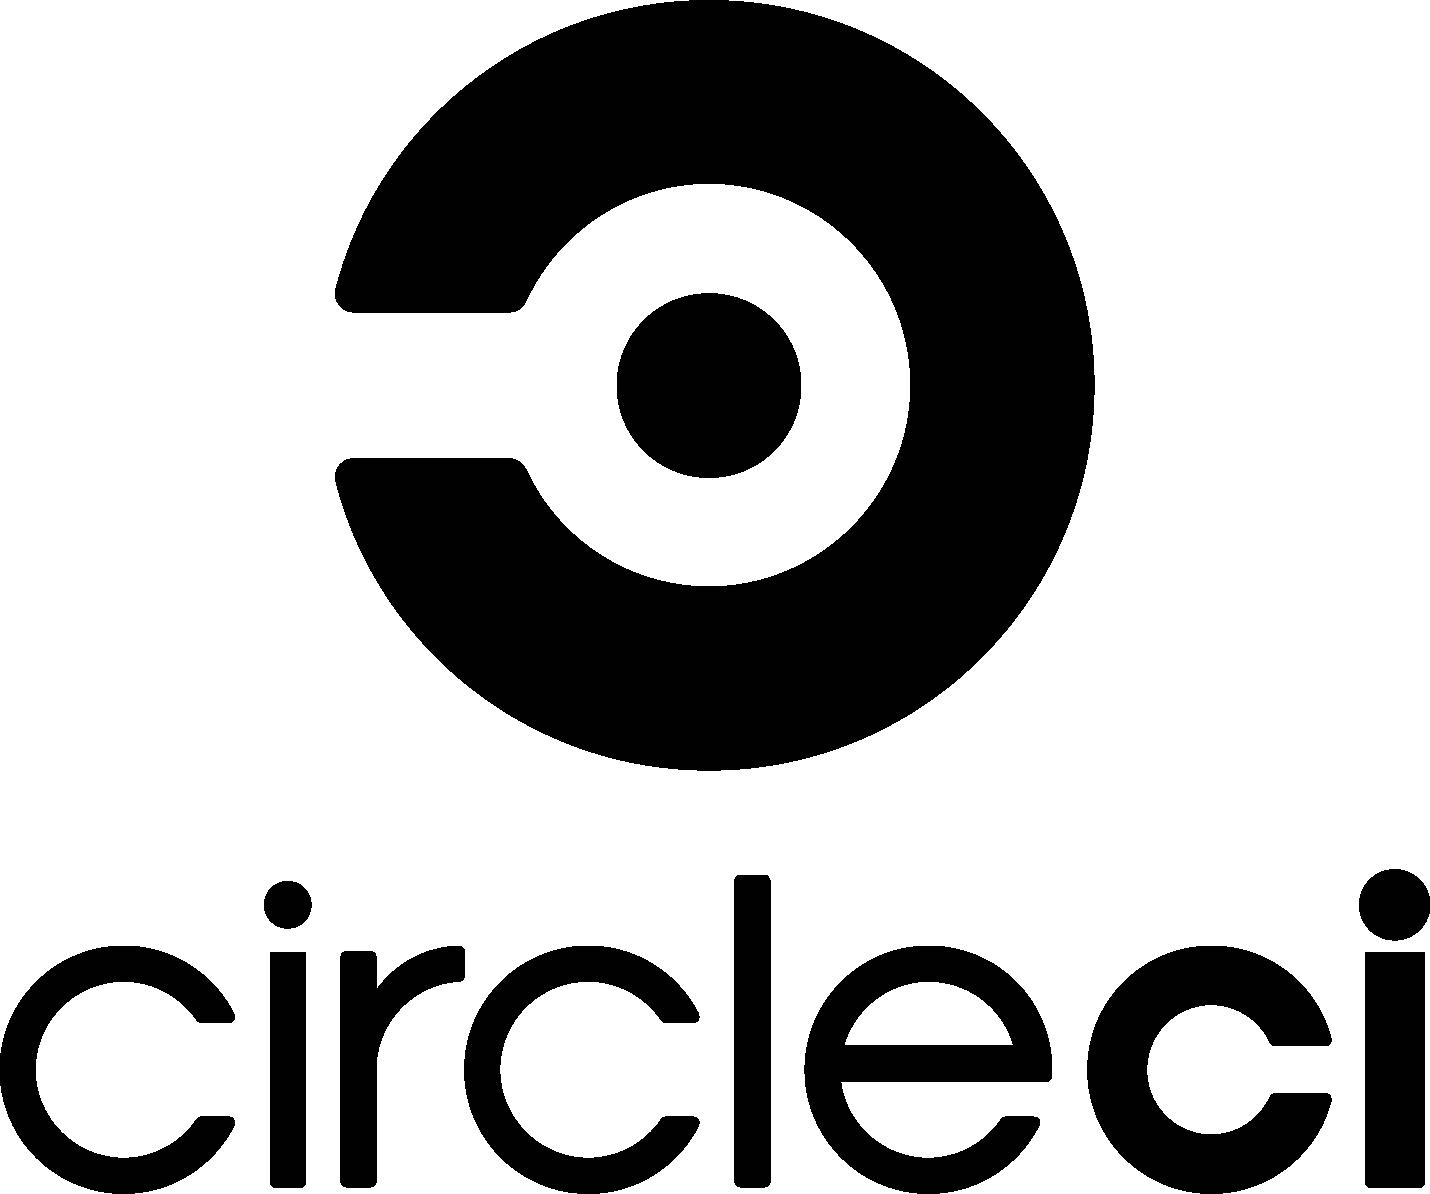 CircleCI Logo png